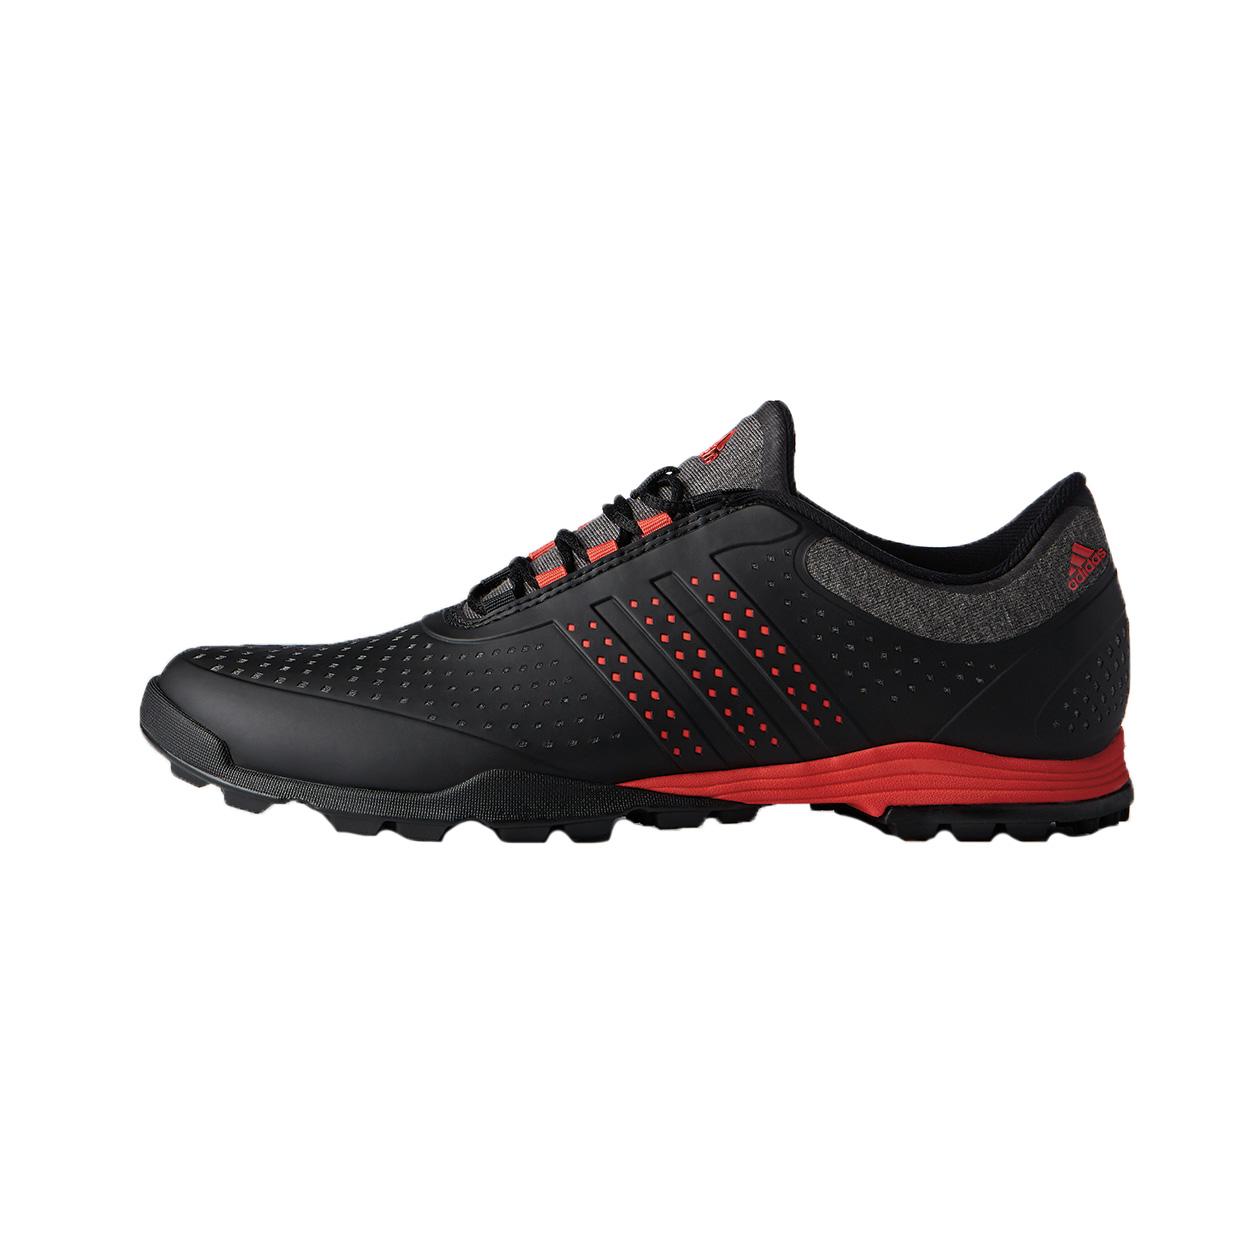 adidas adiPure Sport Women's Golf Shoe - Black/Red